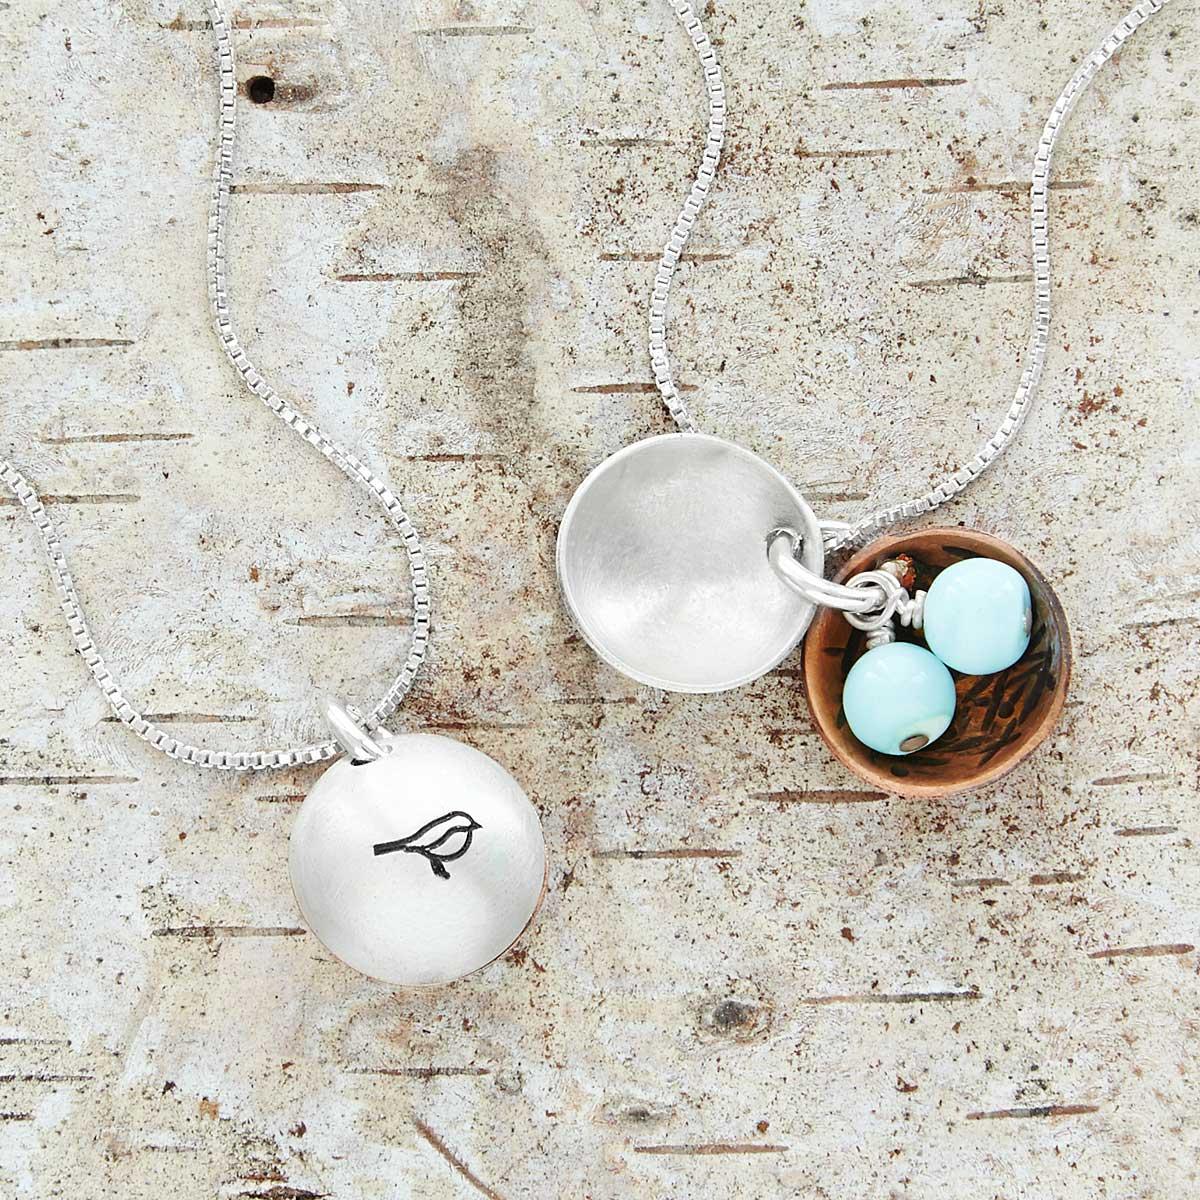 Nest egg necklace mother bird grandmother sentimental jewelry nest egg necklace mozeypictures Images